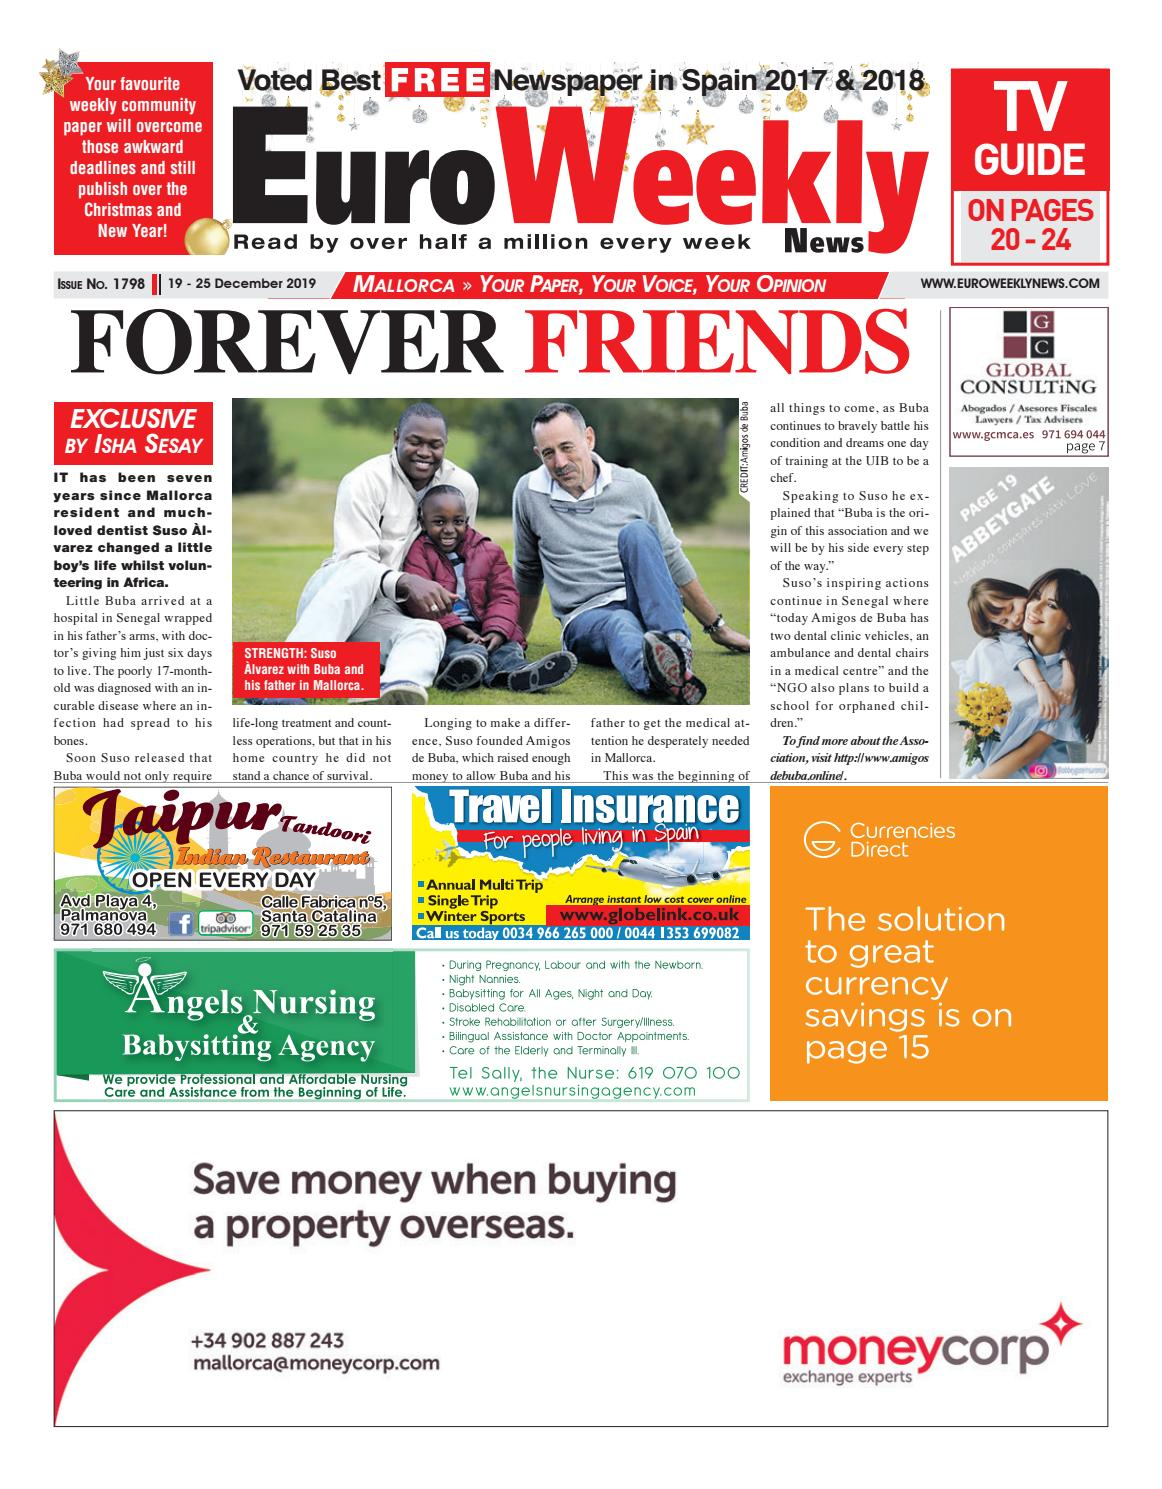 Euro Weekly News  Mallorca 19  25 December 2019 Issue 1798 regarding Isha Lunar Calendar 2020